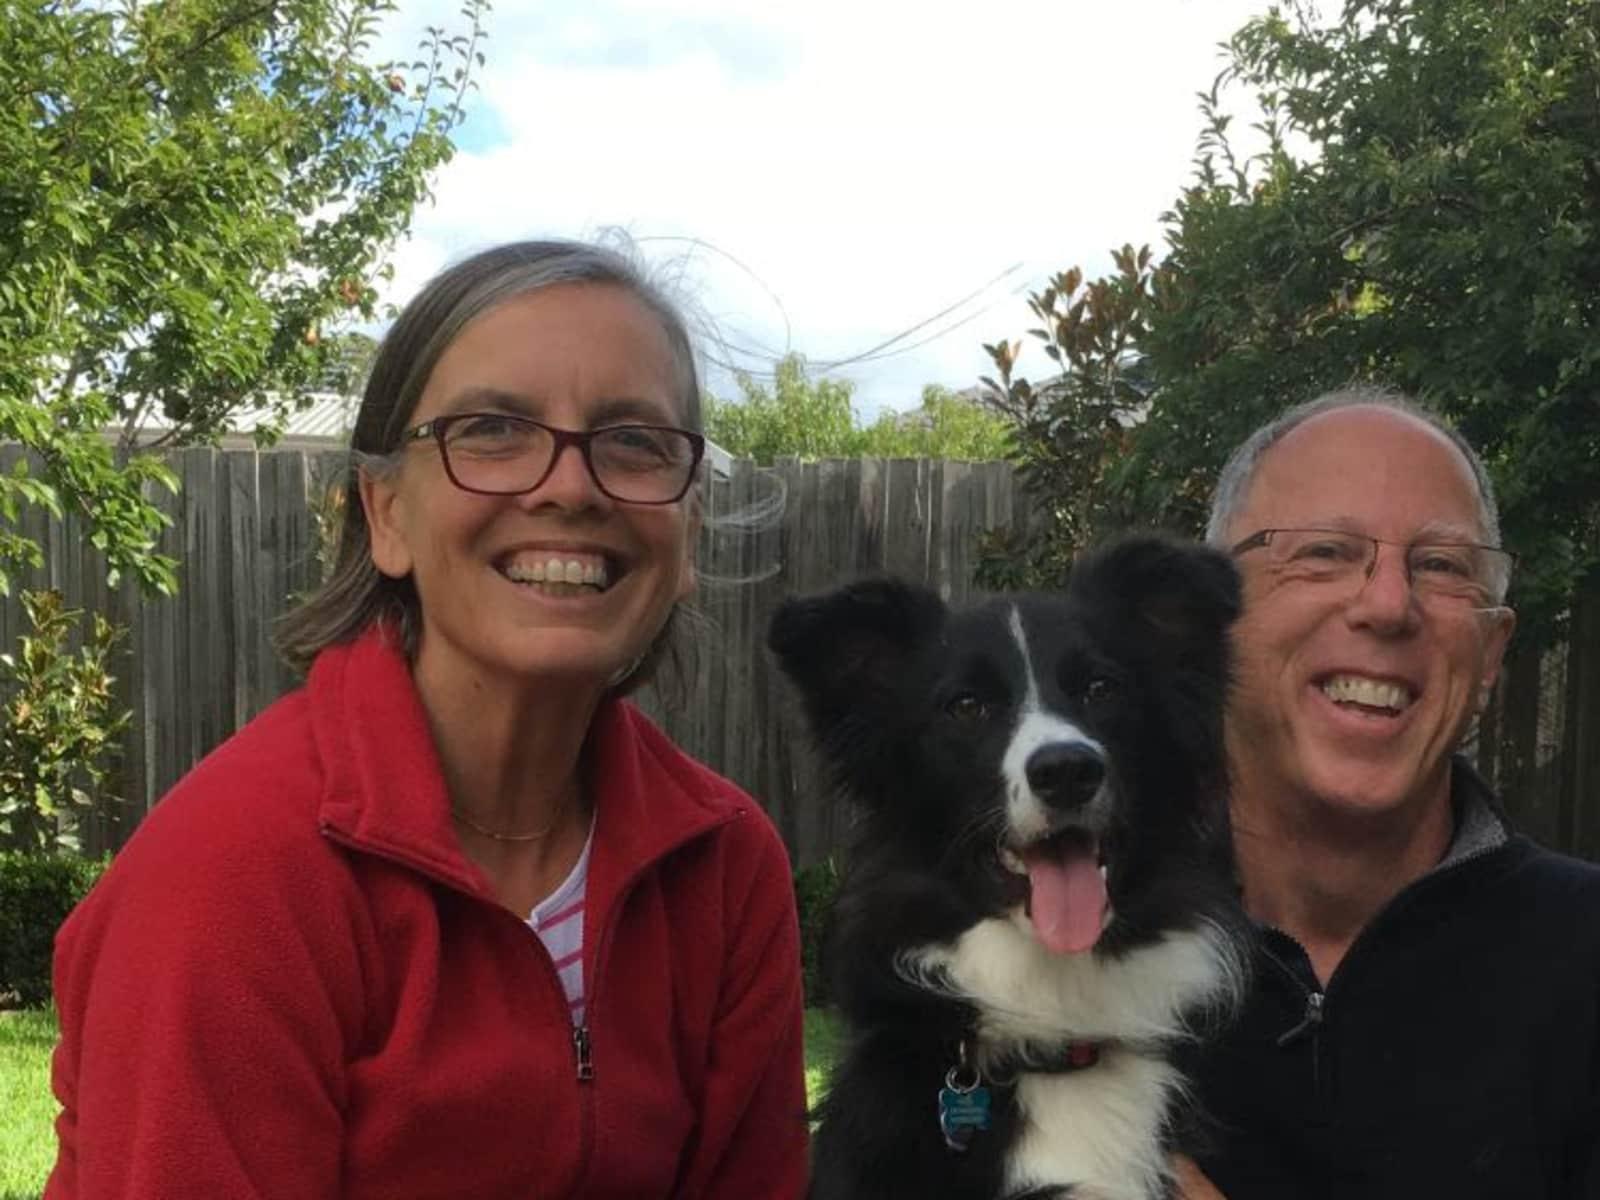 Susan & Bruce from Perth, Western Australia, Australia